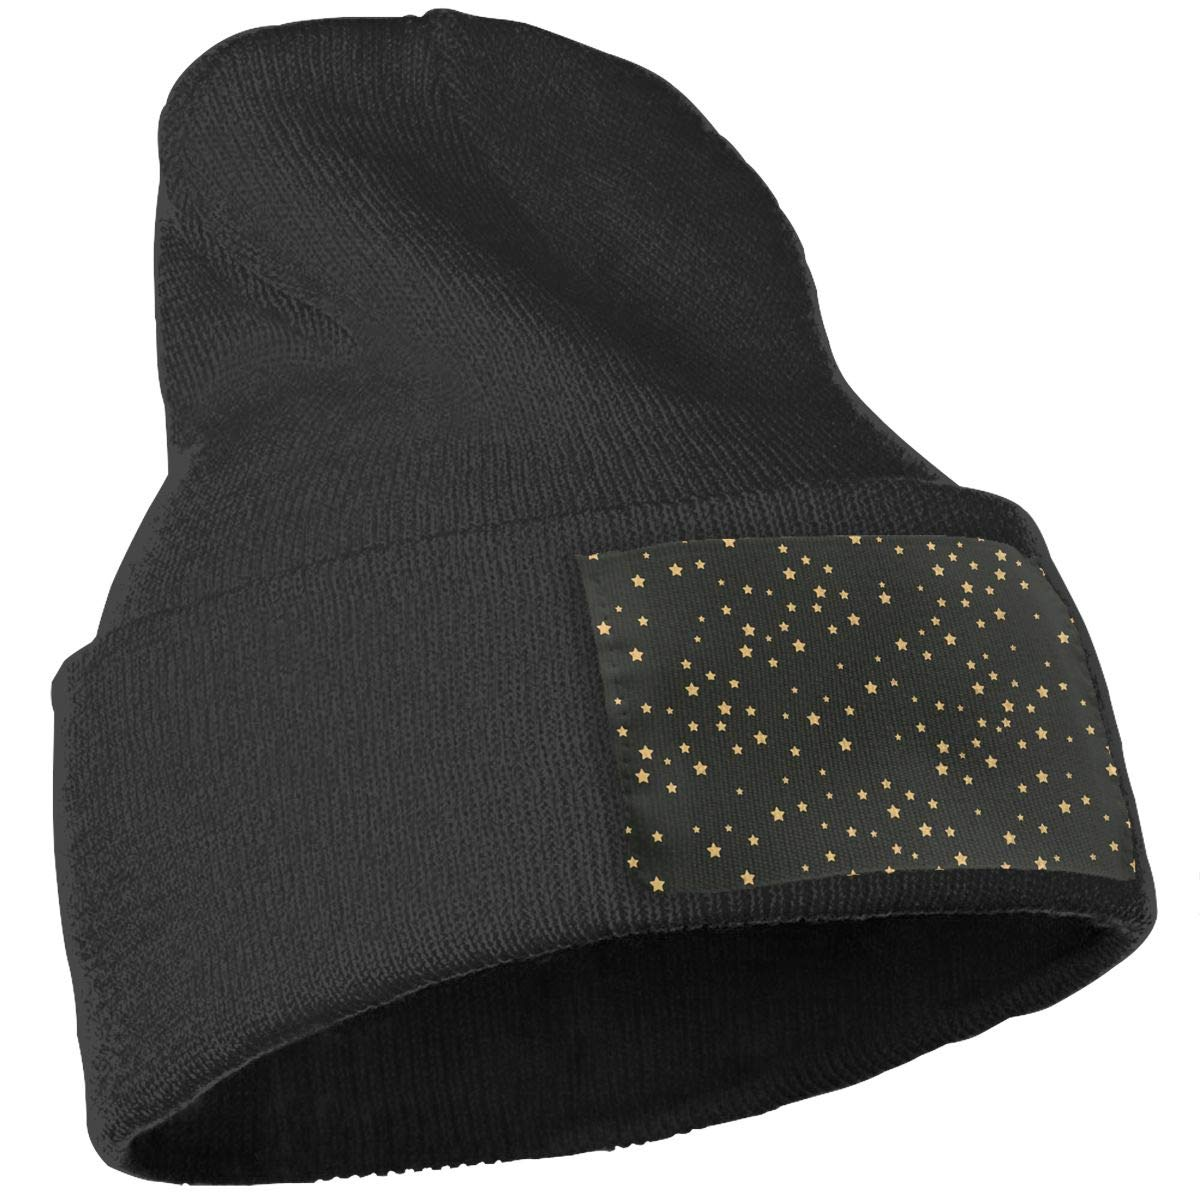 PCaag7v Stars Beanie Hat Winter Solid Warm Knit Unisex Ski Skull Cap